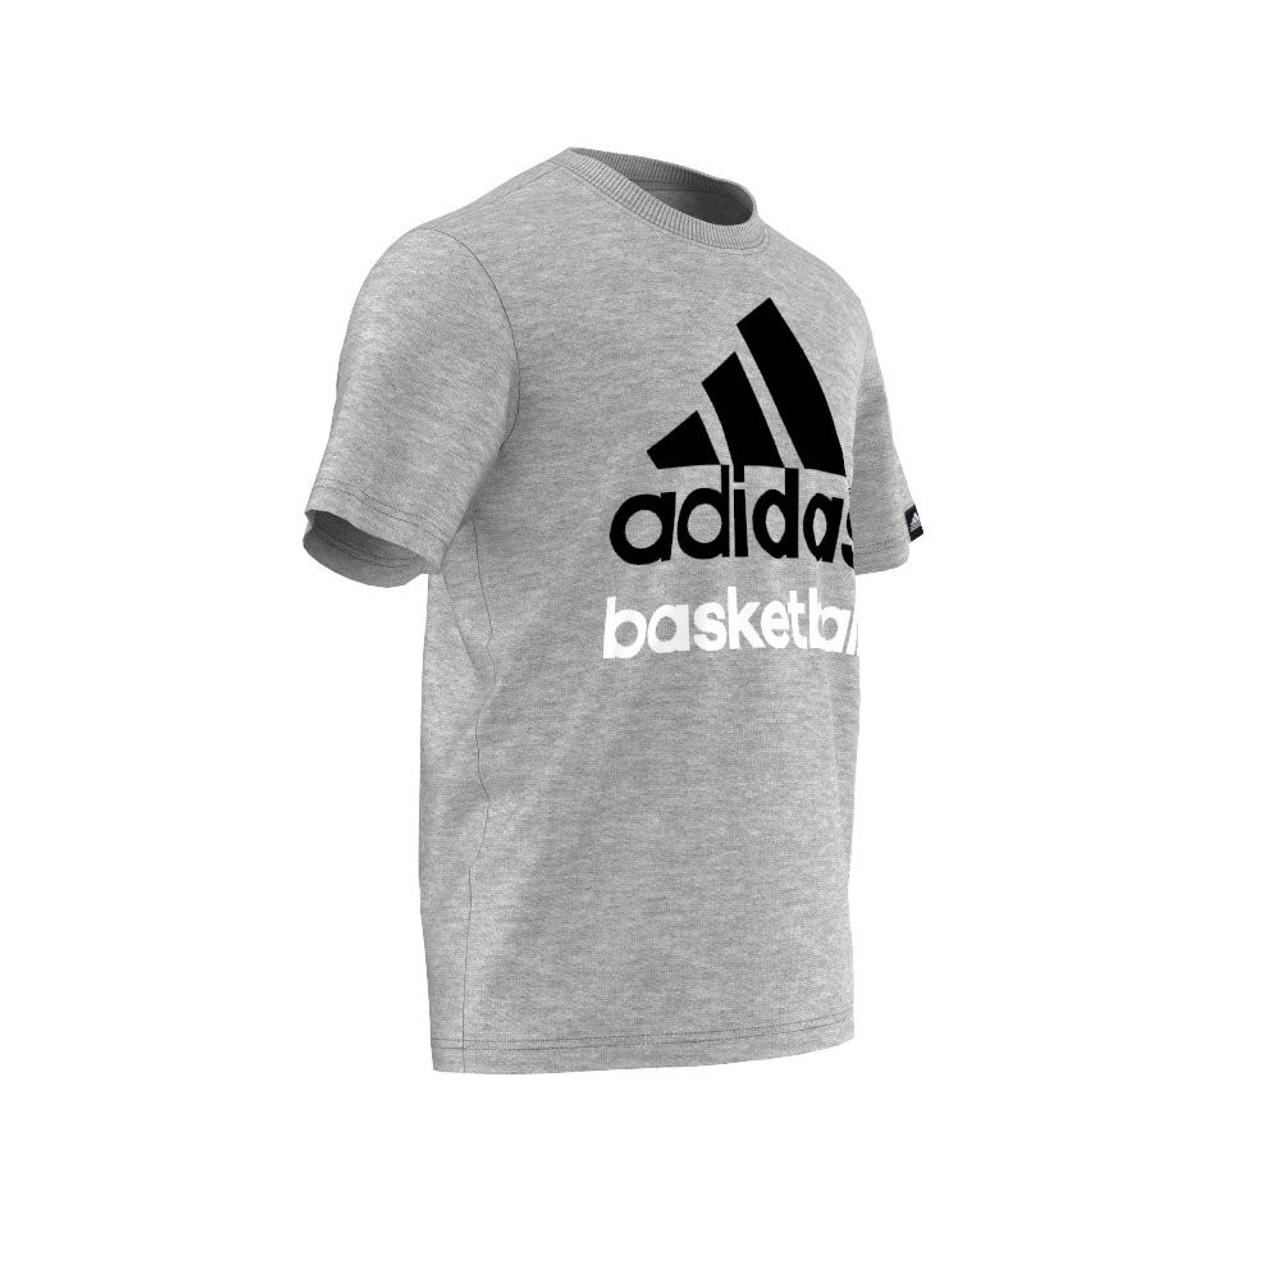 Basketball Basketball Adidas Logo Logo Adidas Shirtgrey Adidas Basketball T Shirtgrey T FcKlJ1